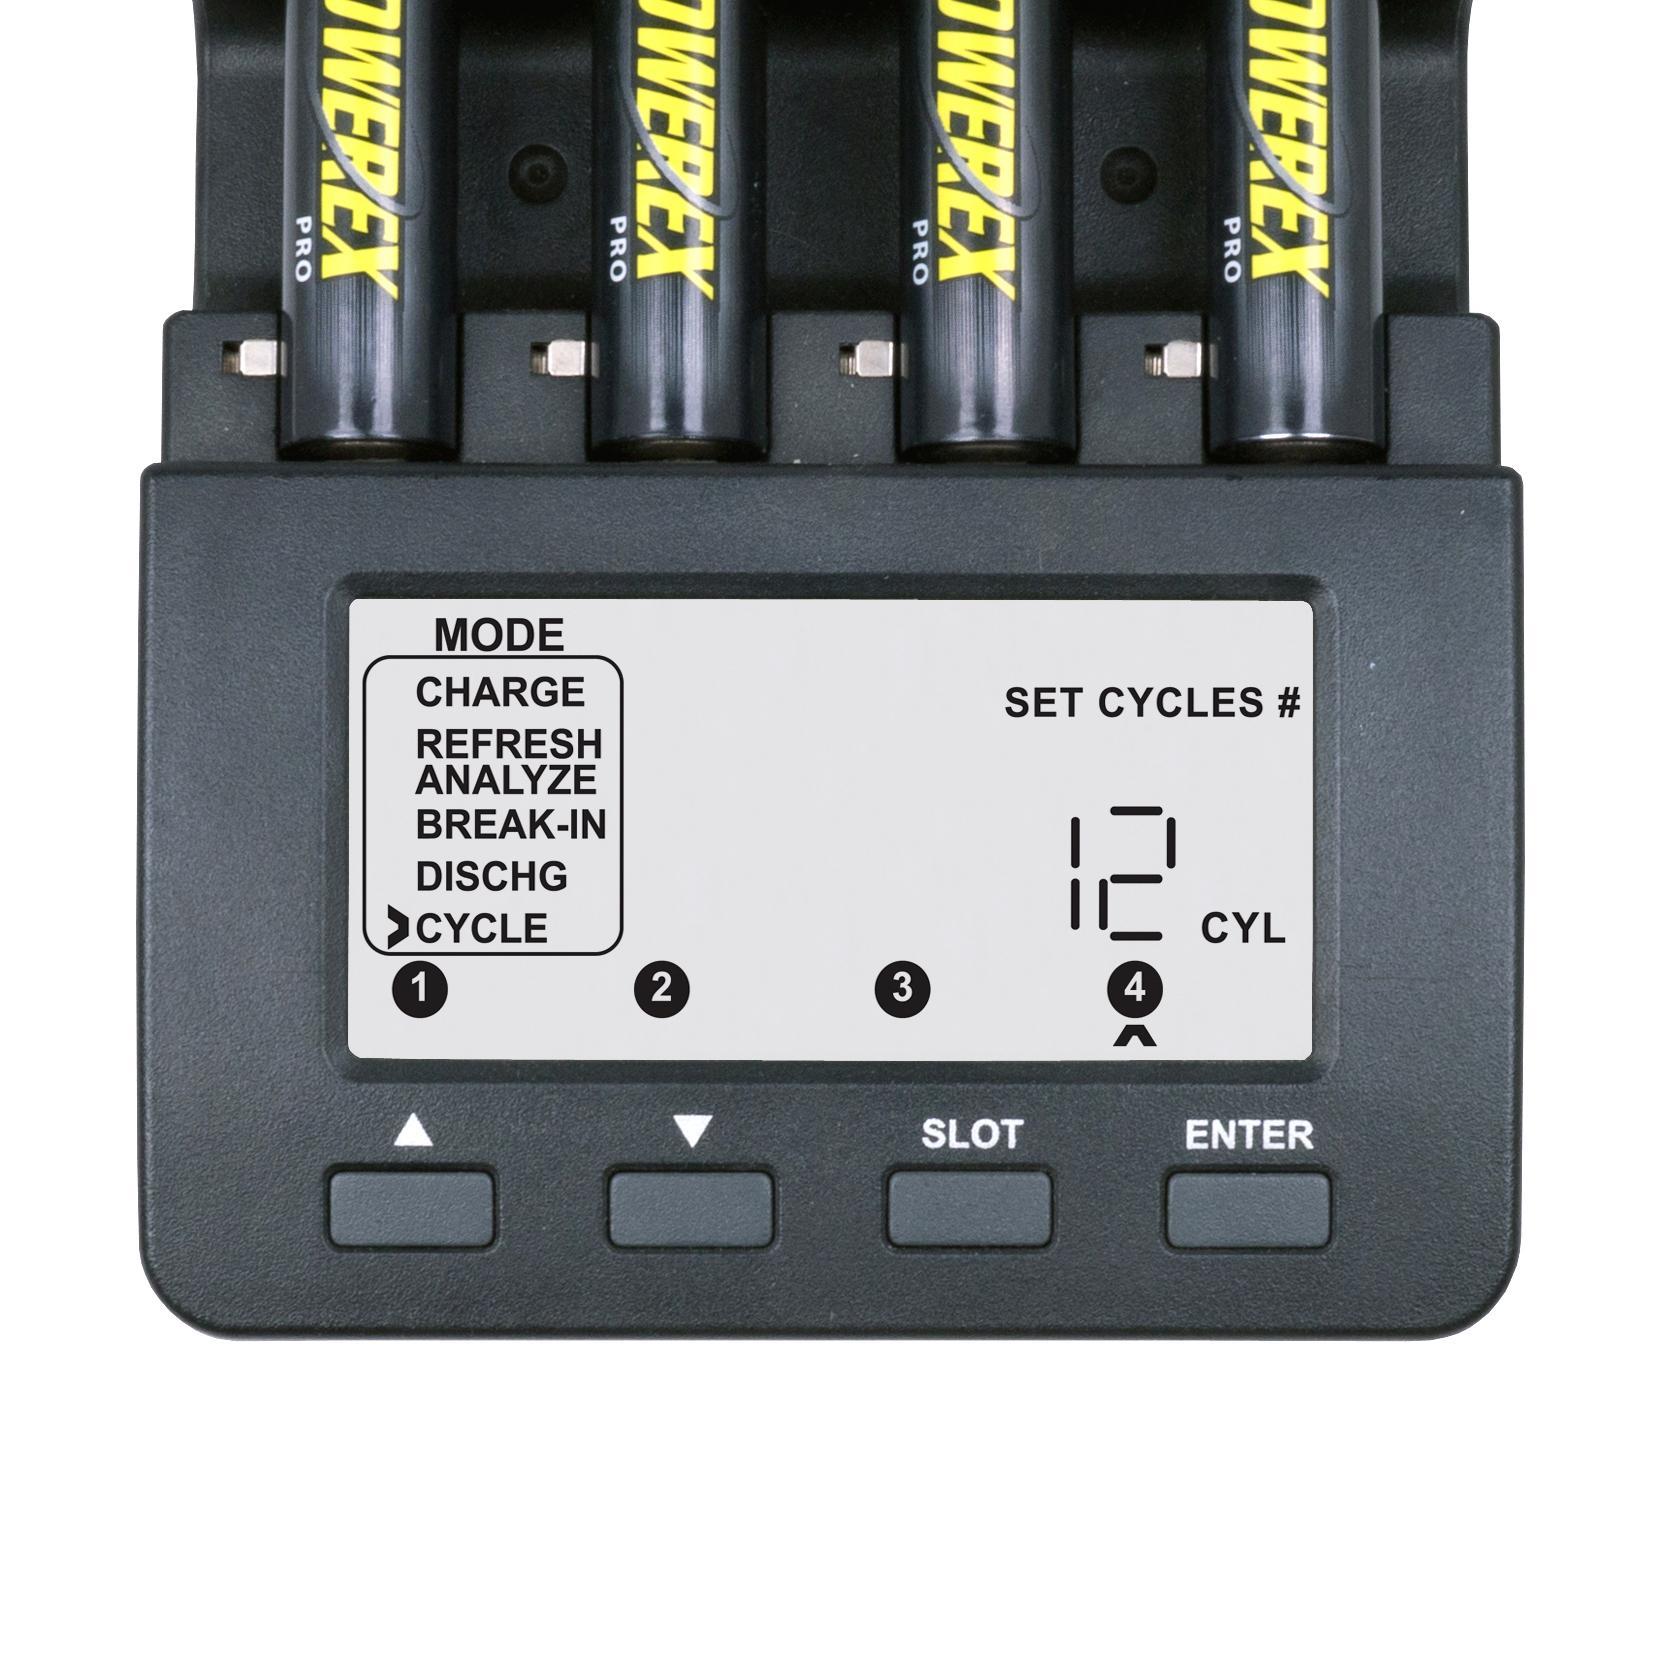 powerex charger mh c9000 manual